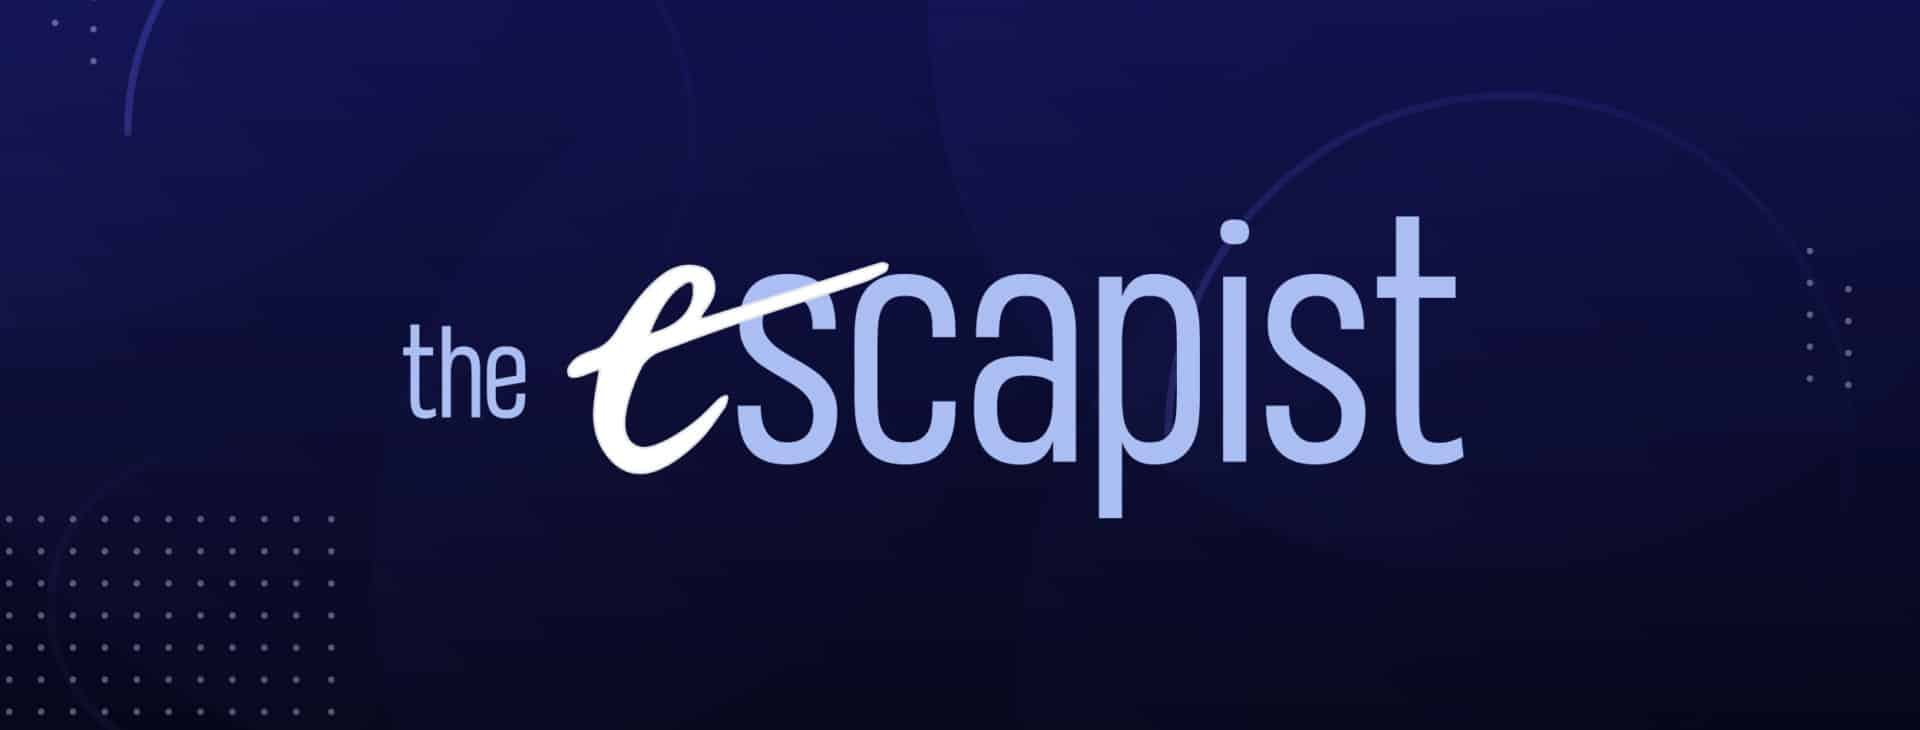 www.escapistmagazine.com